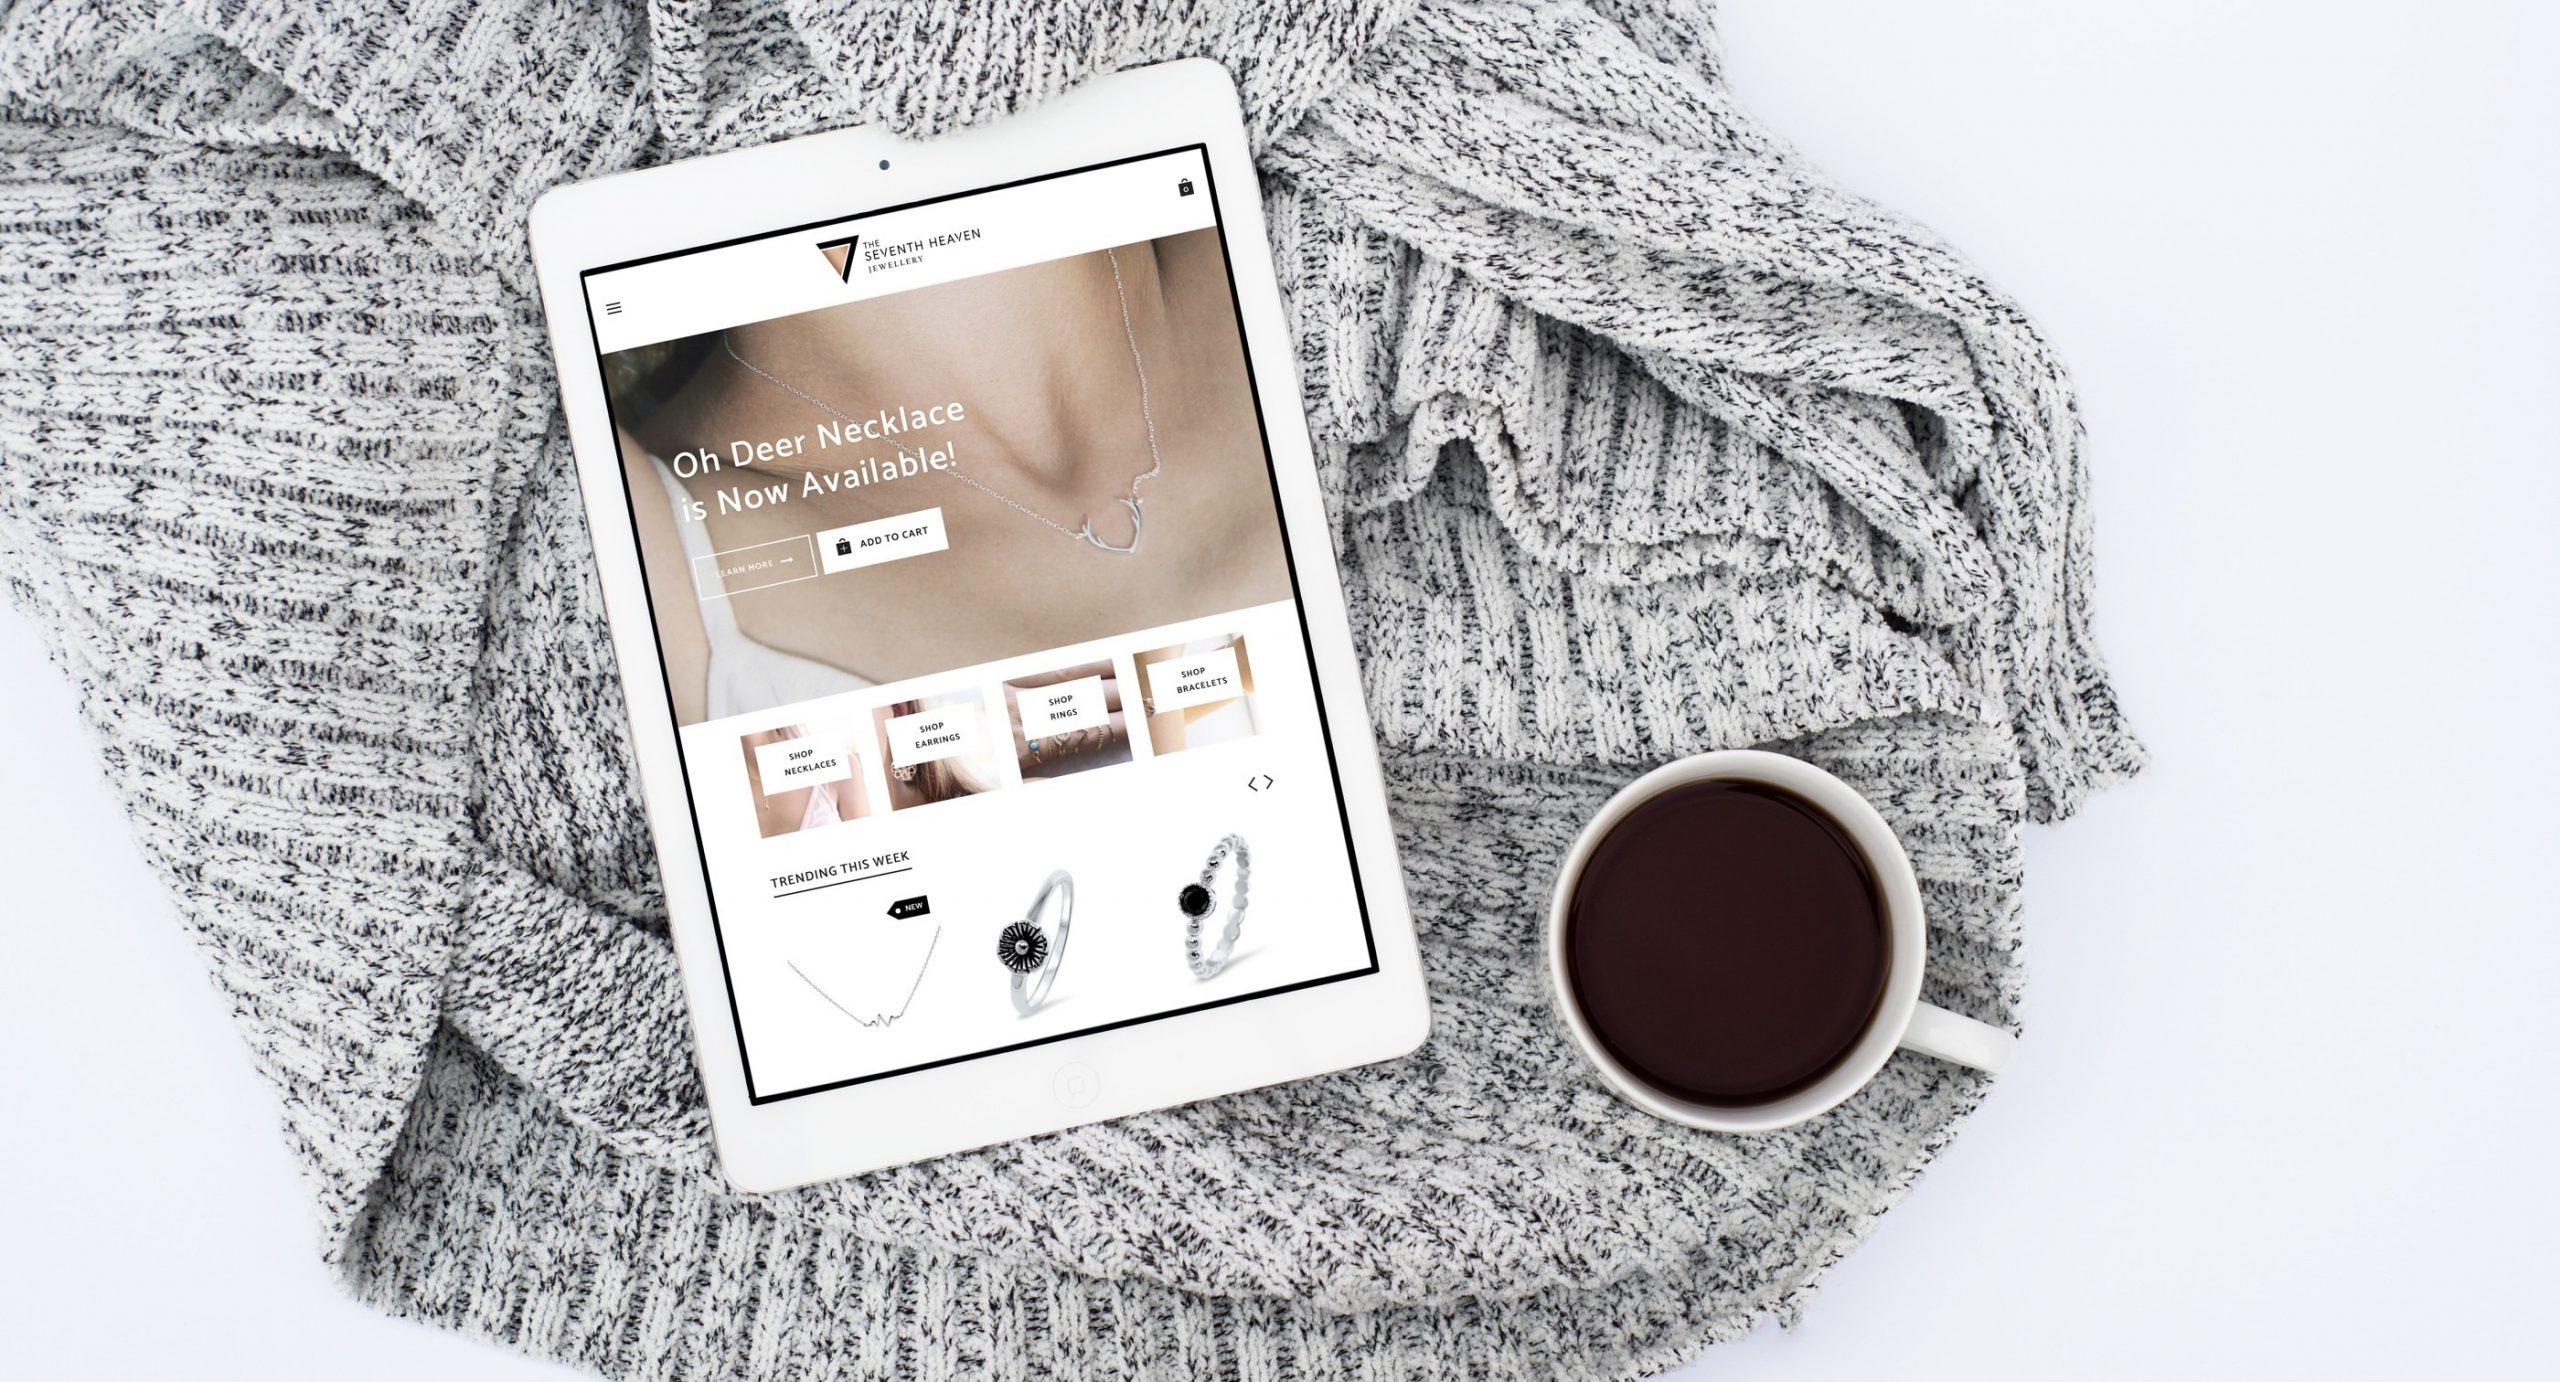 Website shopfront photo example